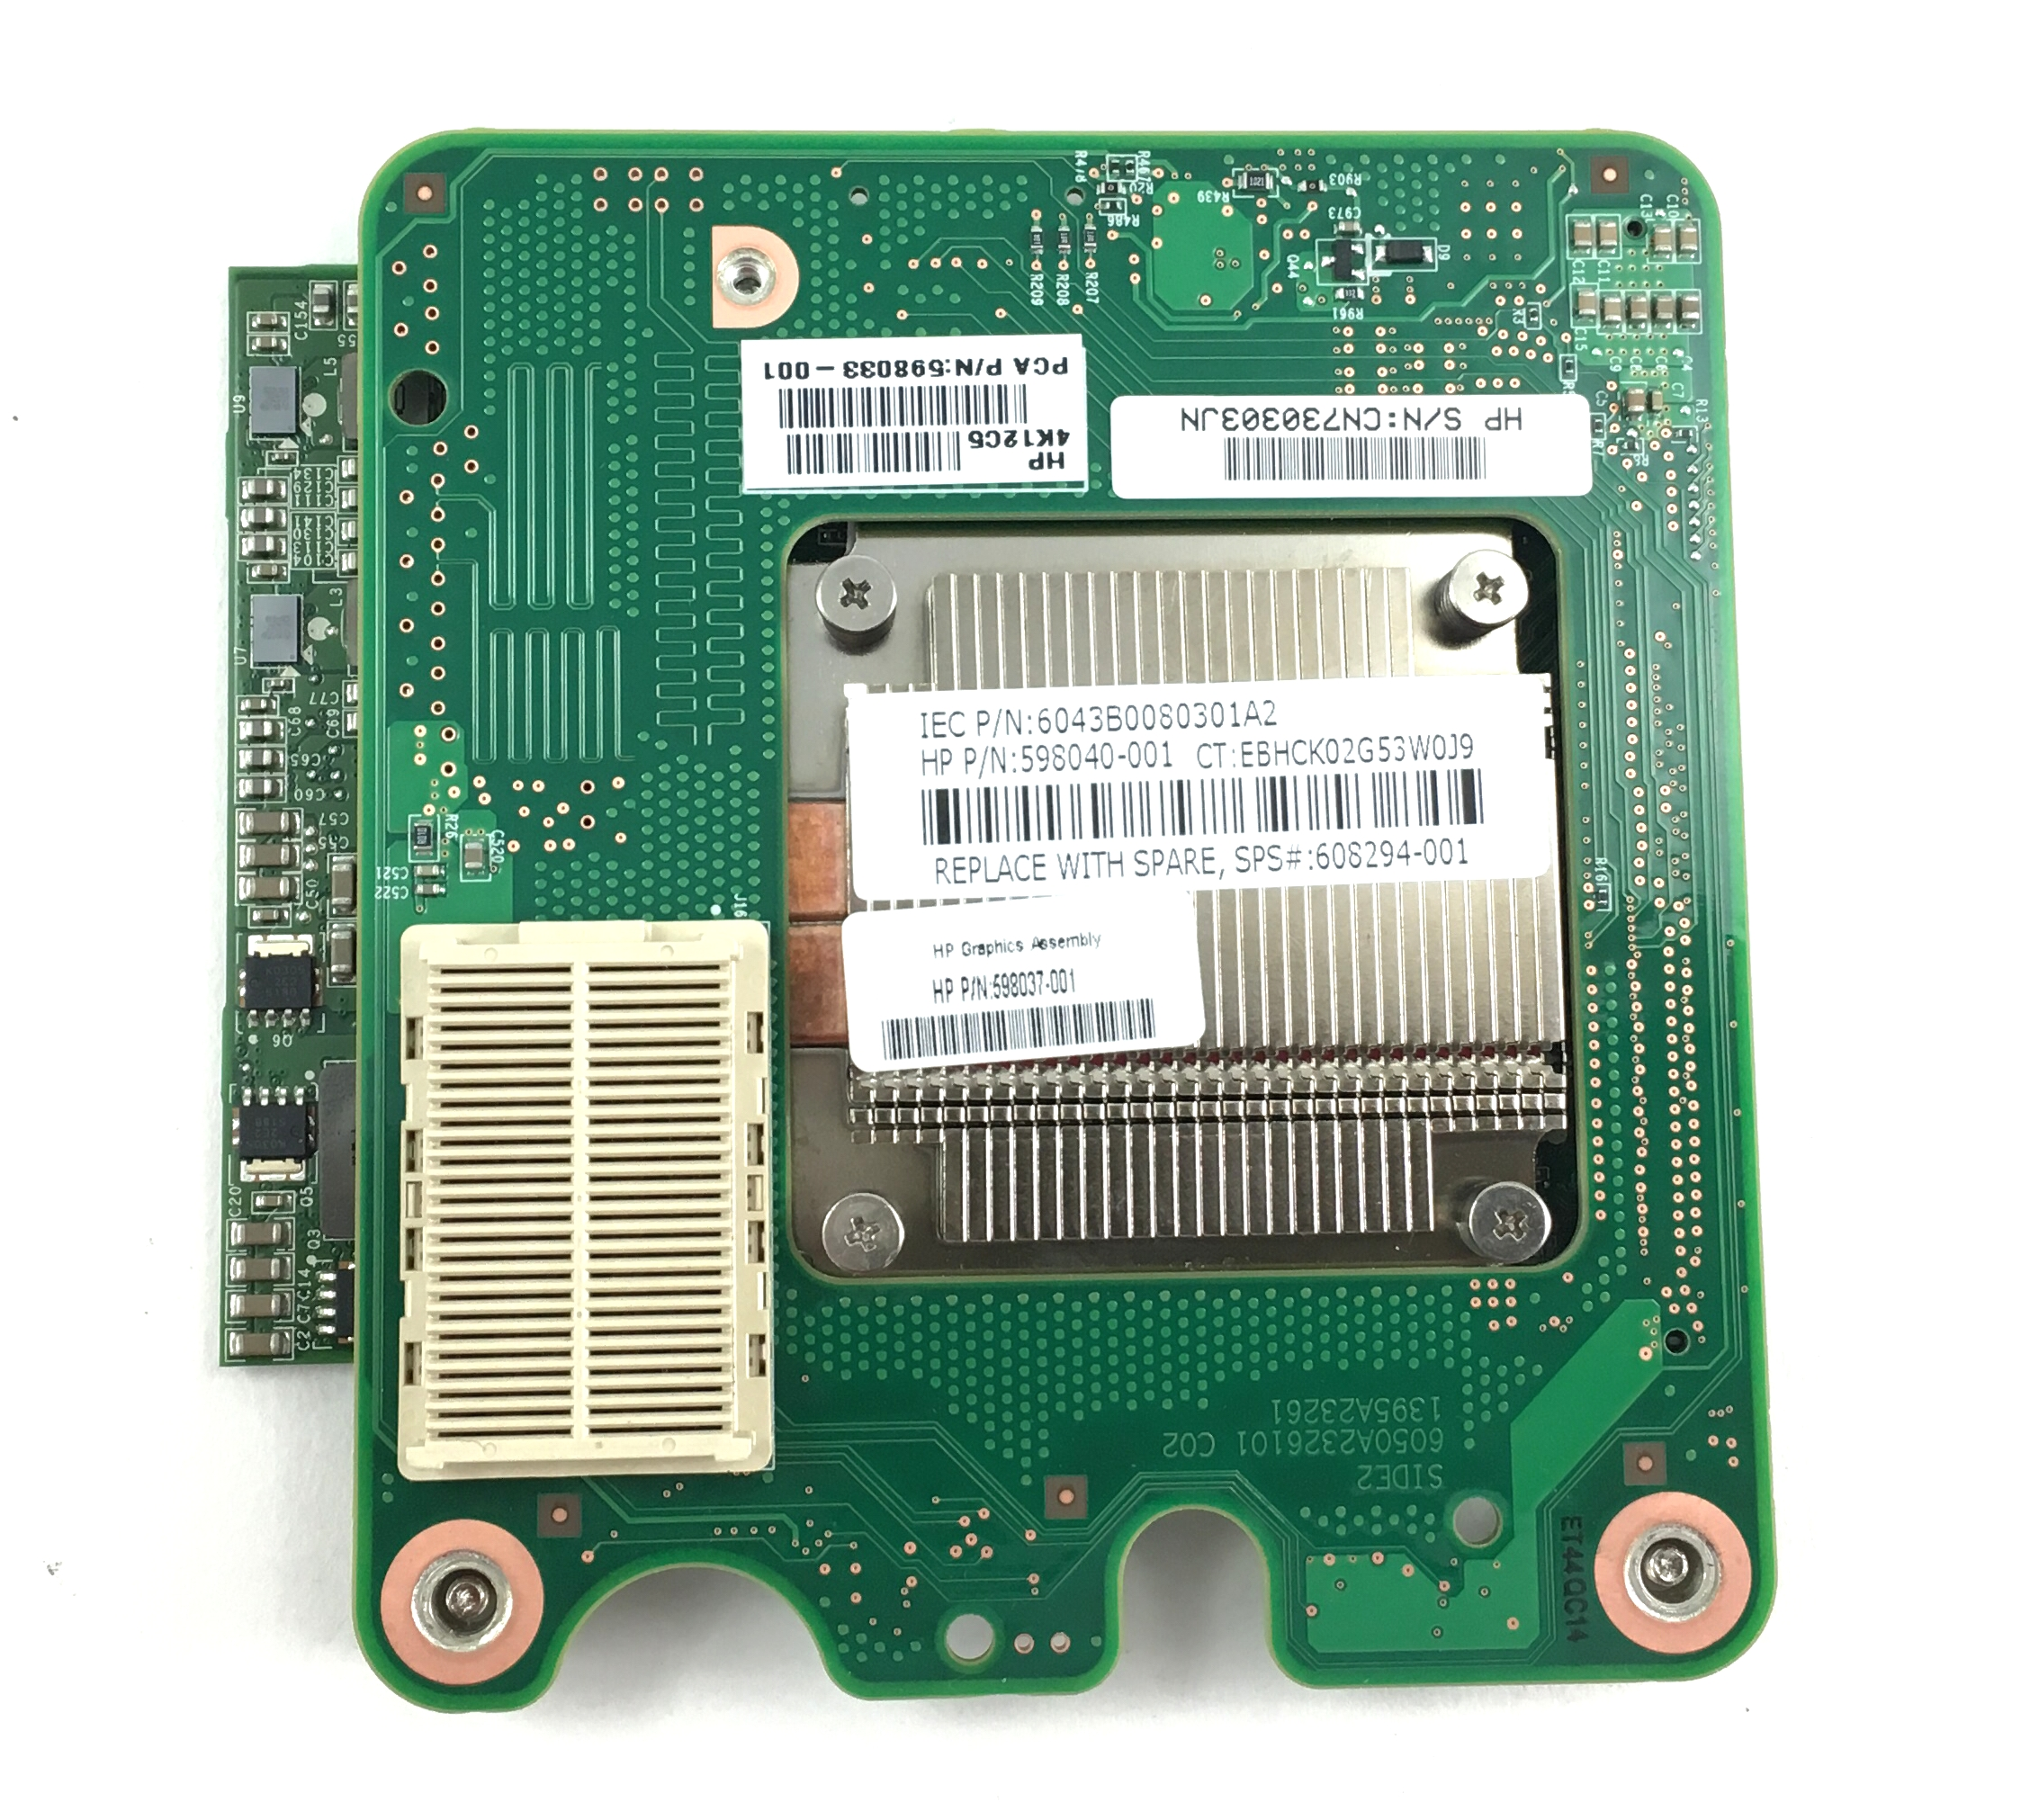 Quadro FX 2800M 1GB Mez Gfx Graphics Card (608294-001)